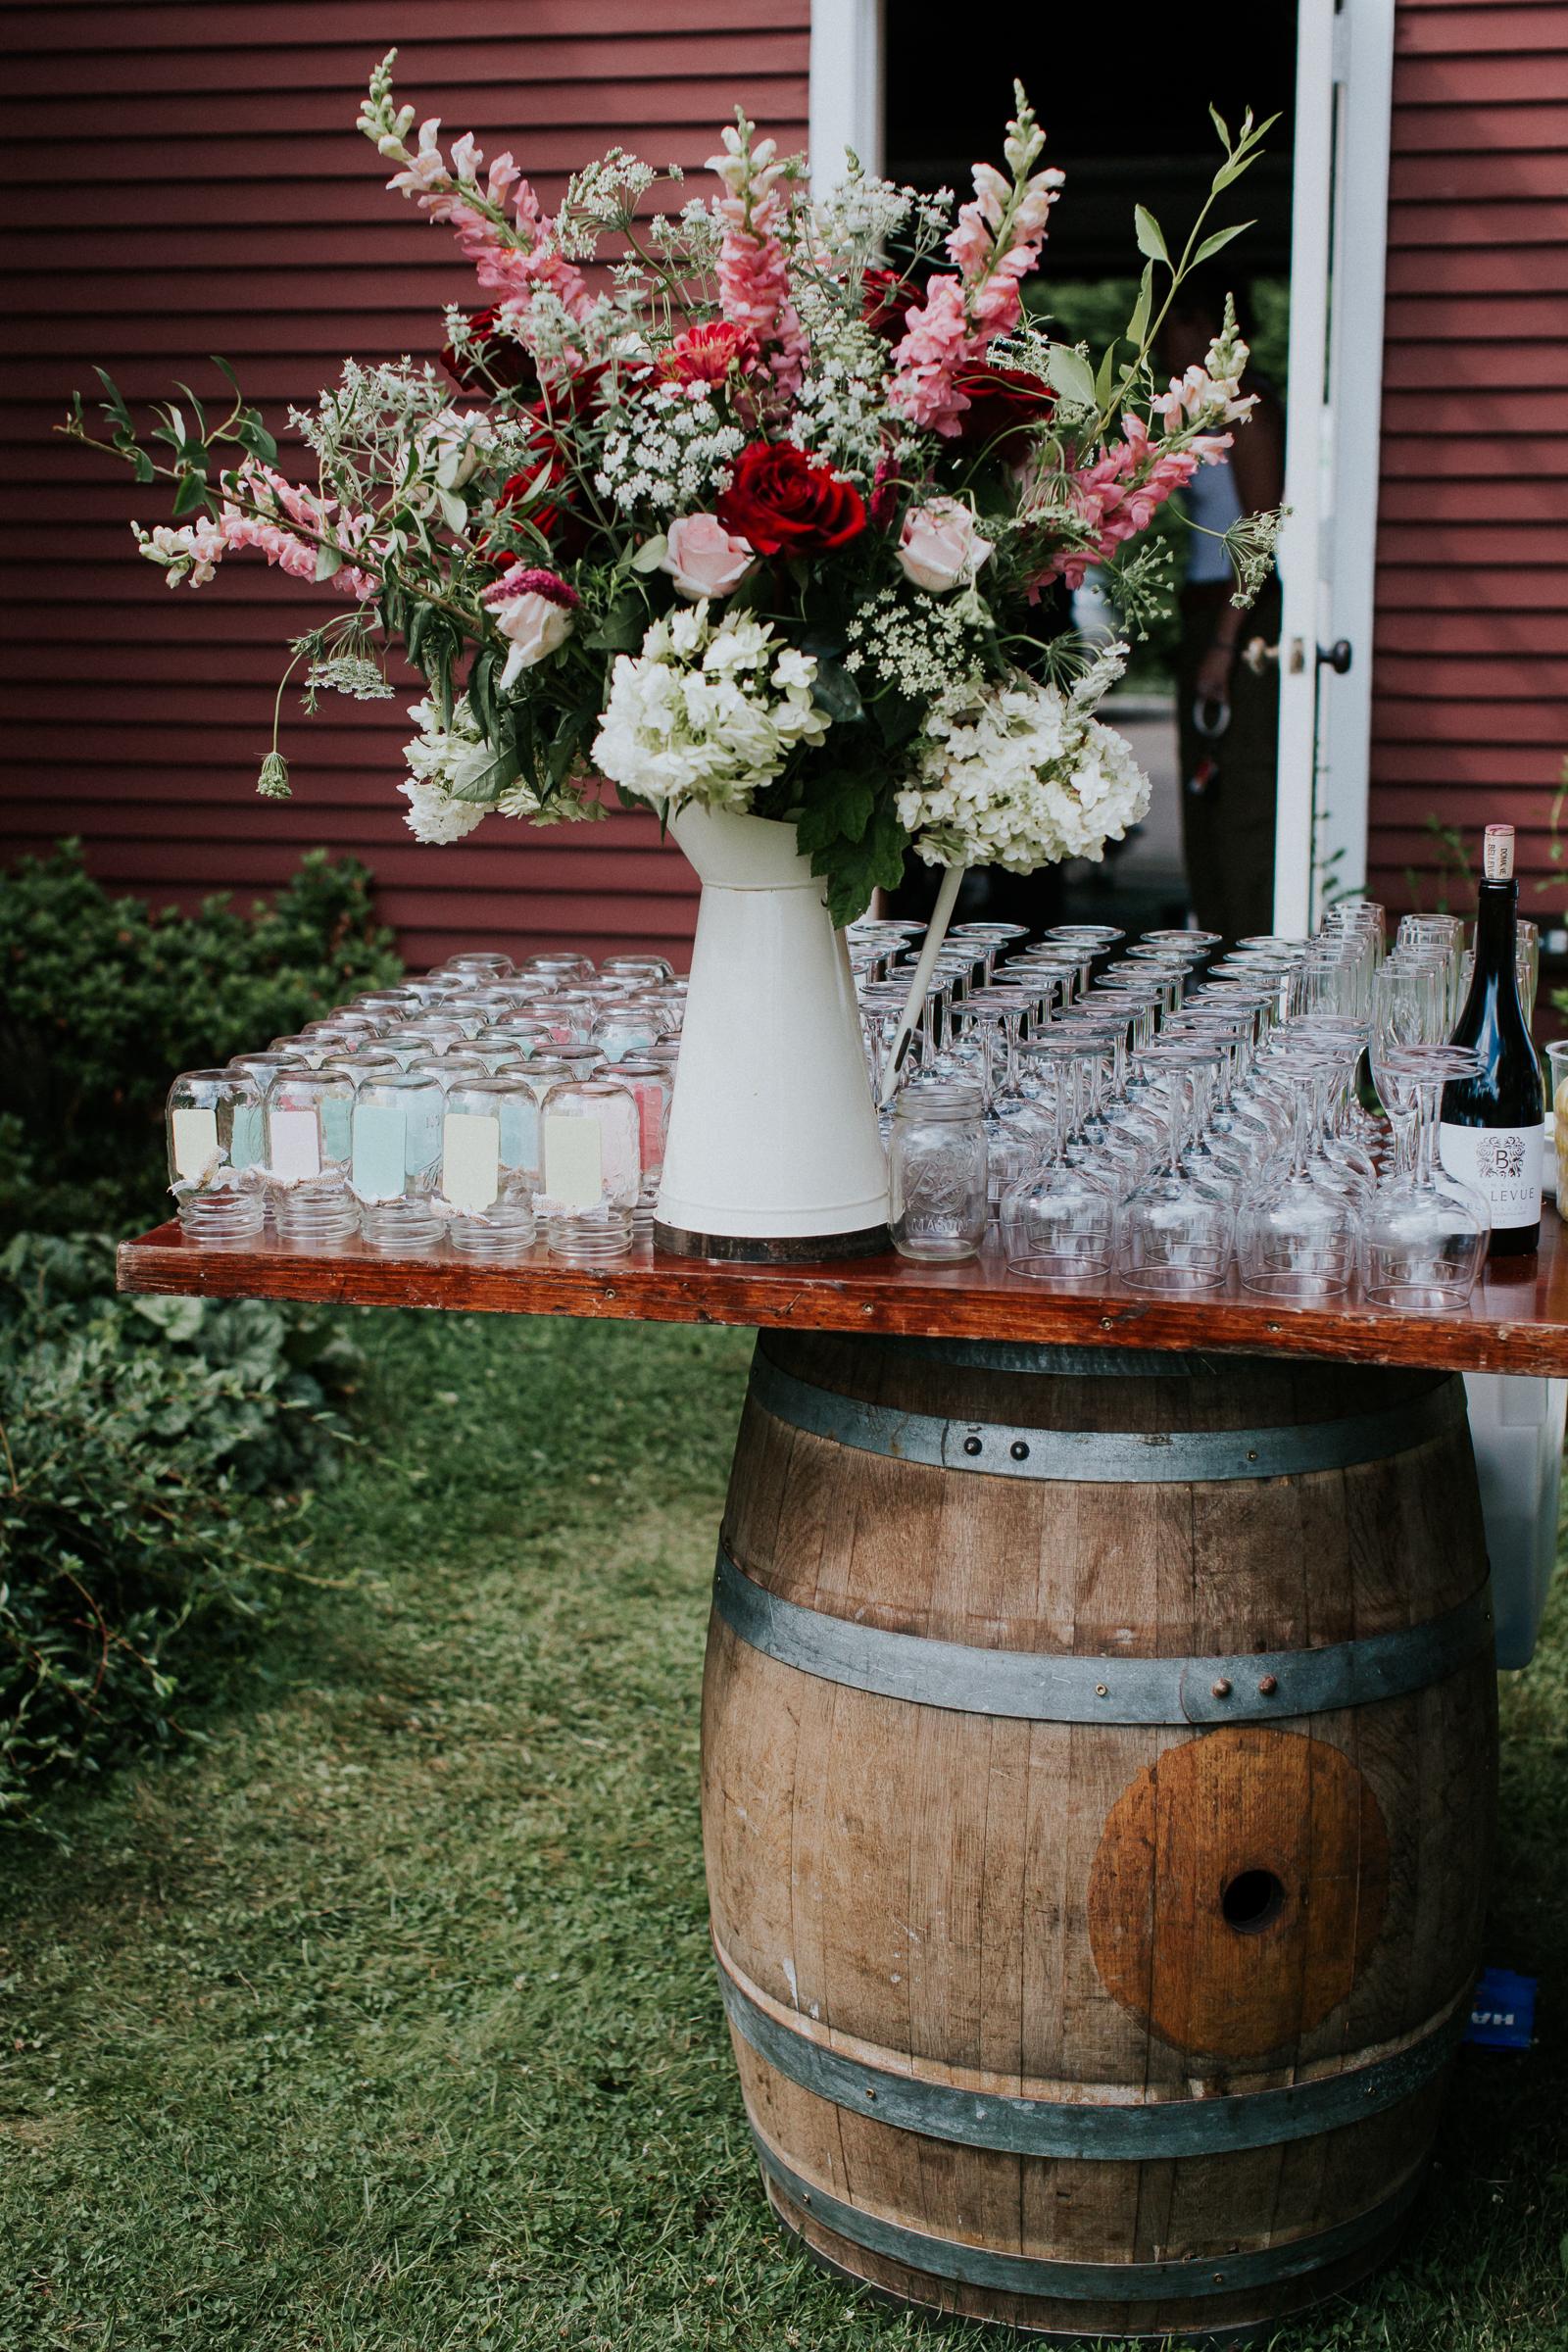 Backyard-Intimate-Adventurous-Destination-Wedding-Darien-Connecticut-Documentary-Wedding-Photography-45.jpg